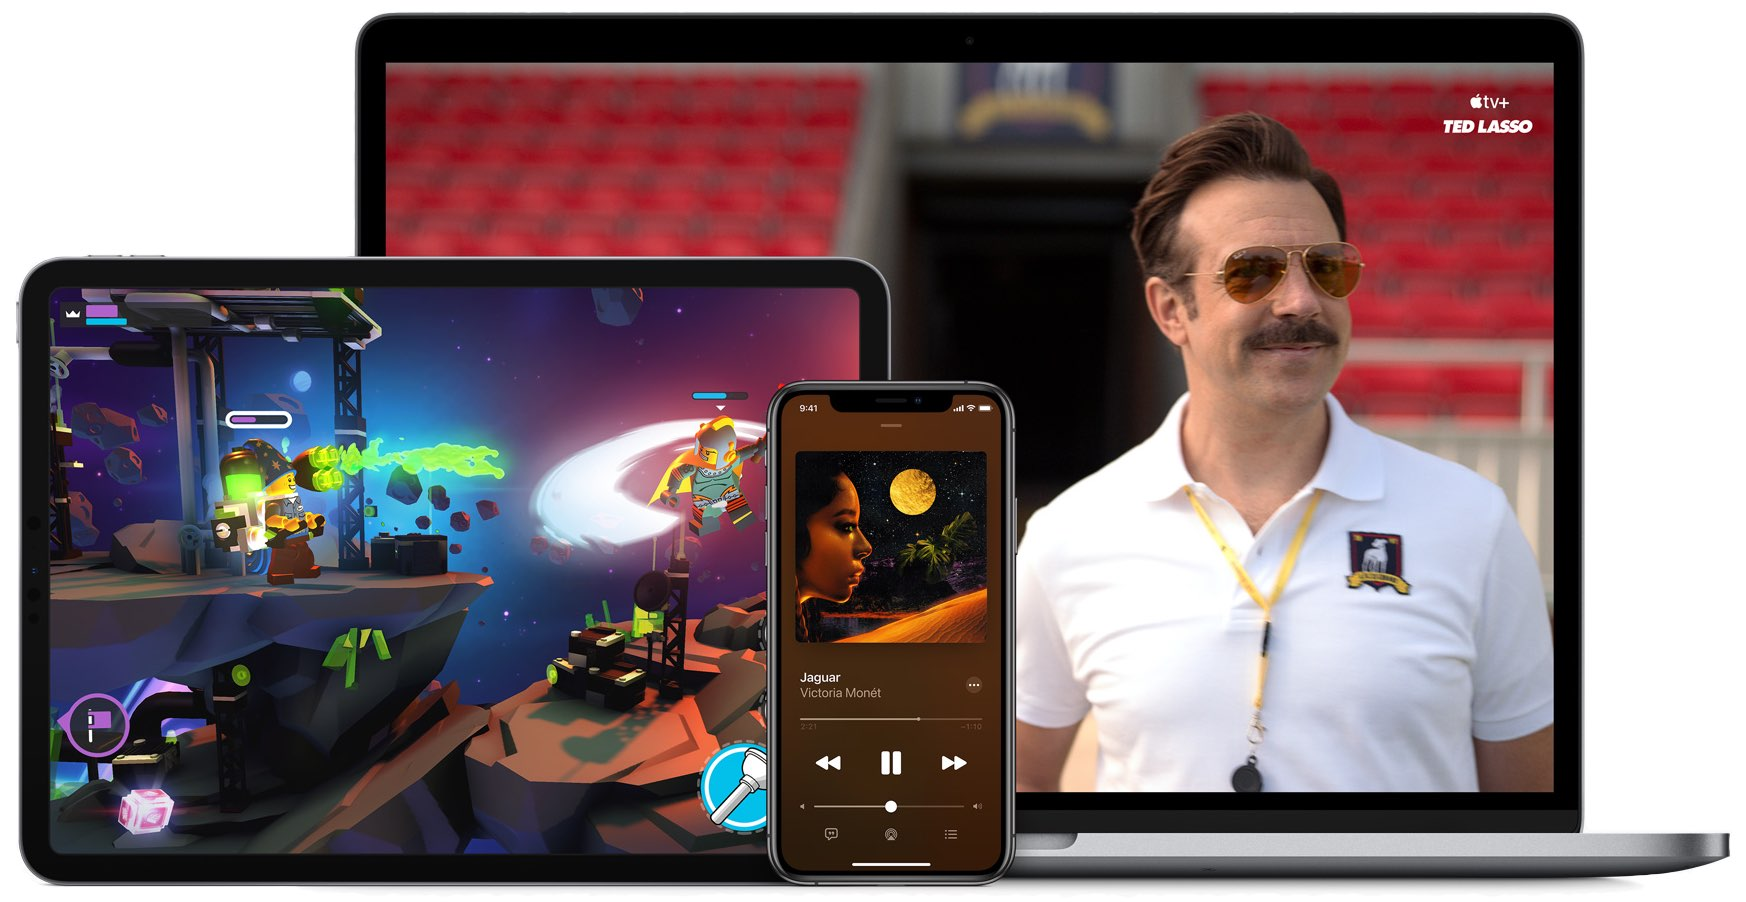 Apple One subscription bundle - hero image